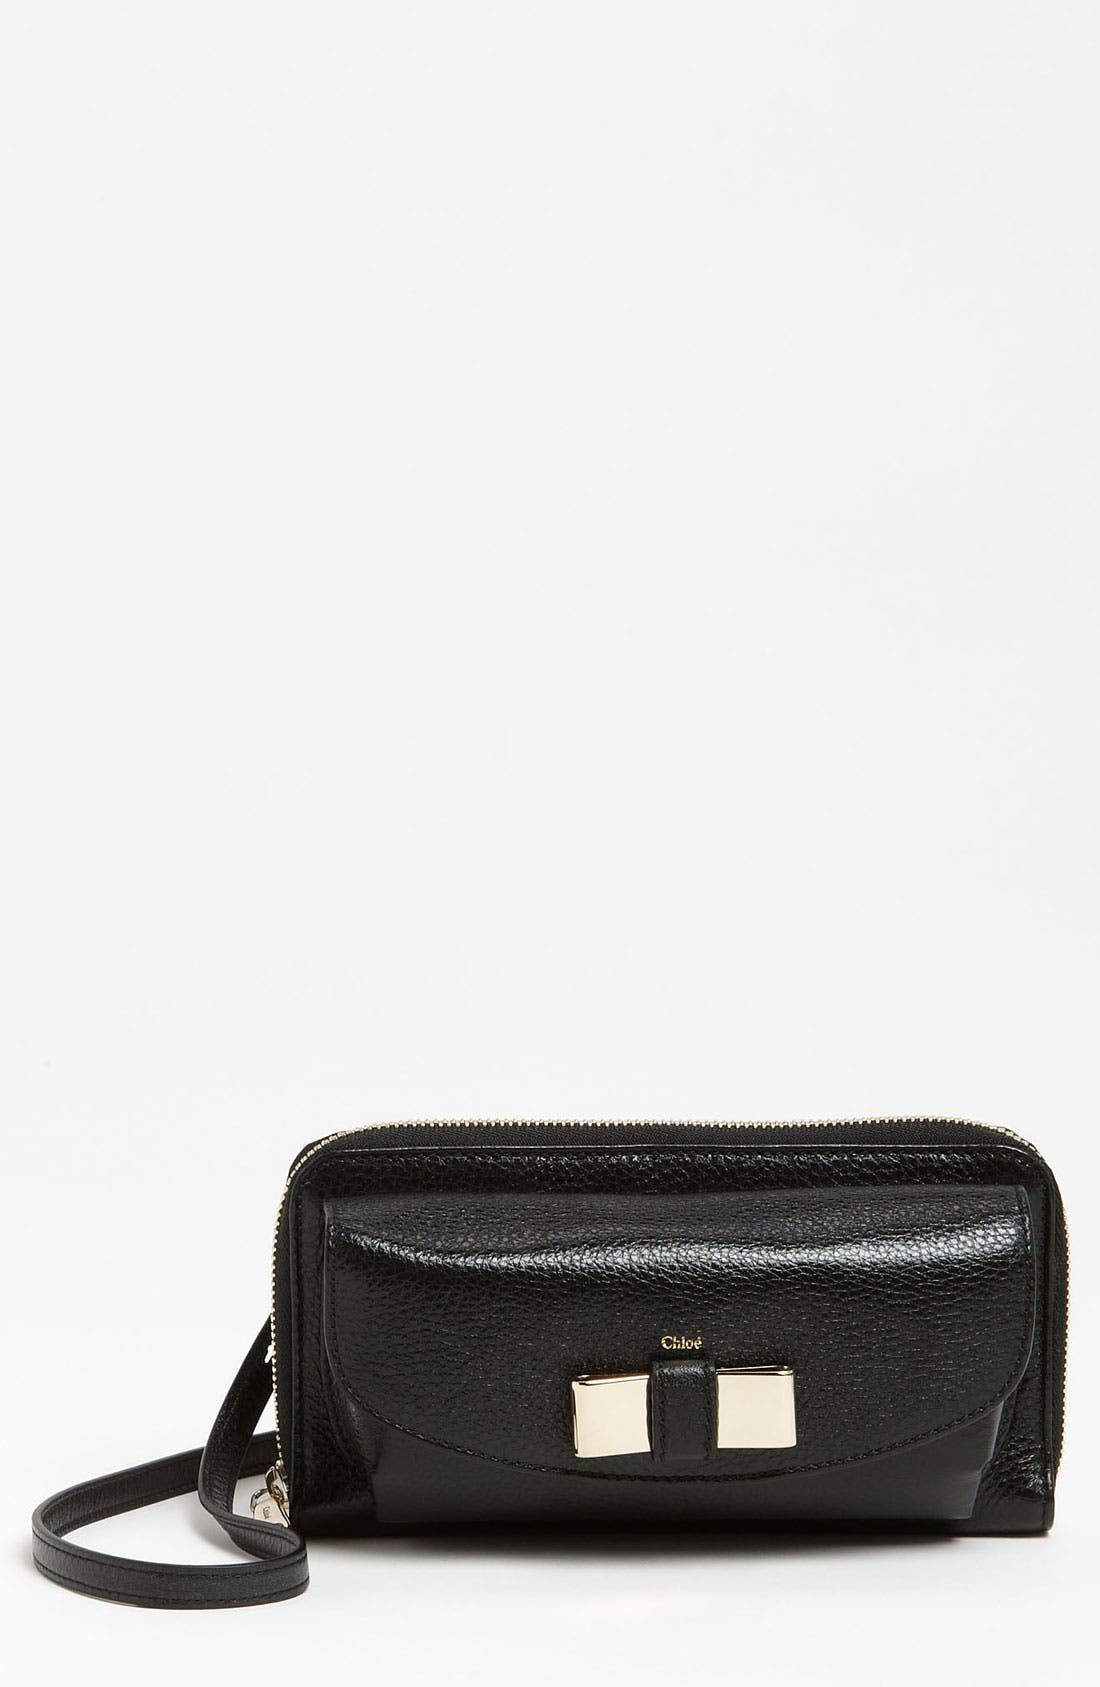 Alternate Image 1 Selected - Chloé 'Lily - Long' Sunglasses Case & Crossbody Wallet